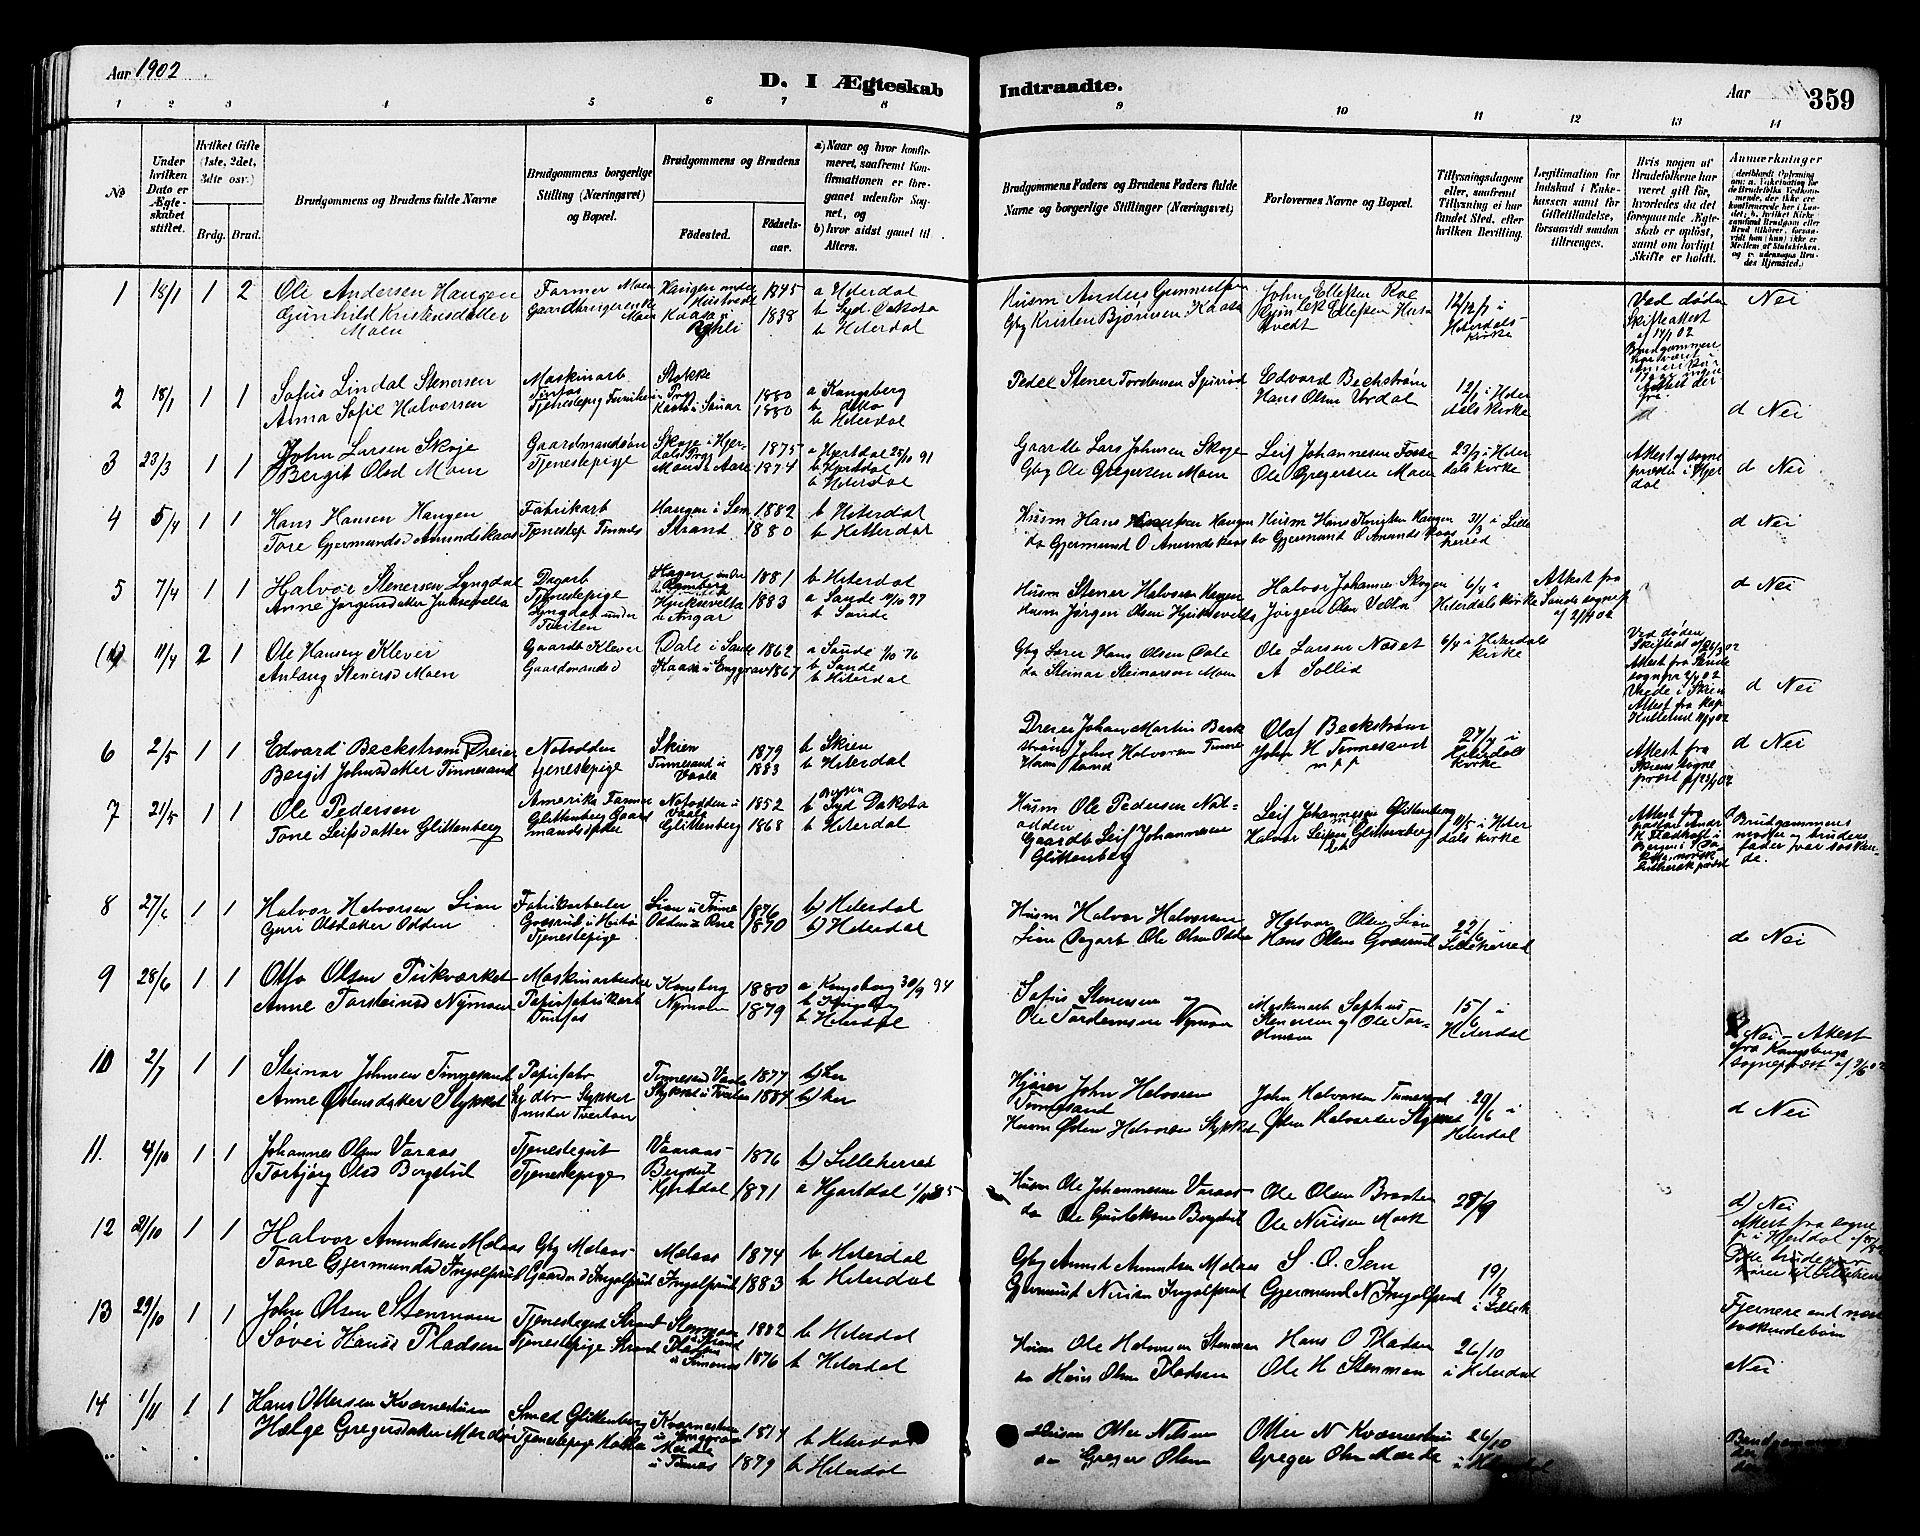 SAKO, Heddal kirkebøker, G/Ga/L0002: Klokkerbok nr. I 2, 1879-1908, s. 359